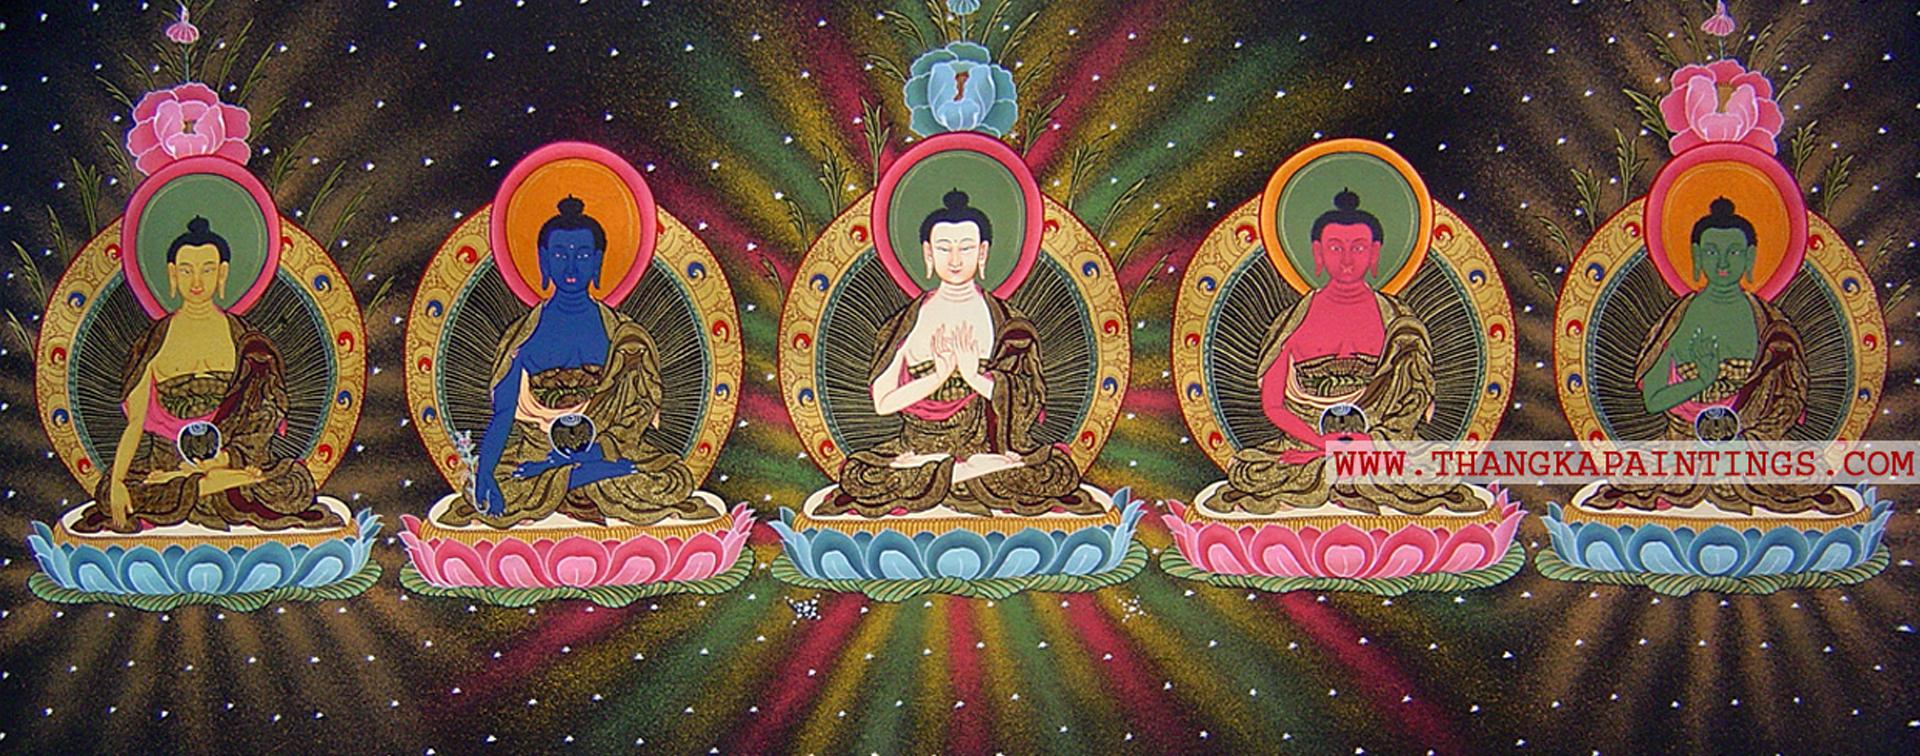 Pancha Buddha Thangka